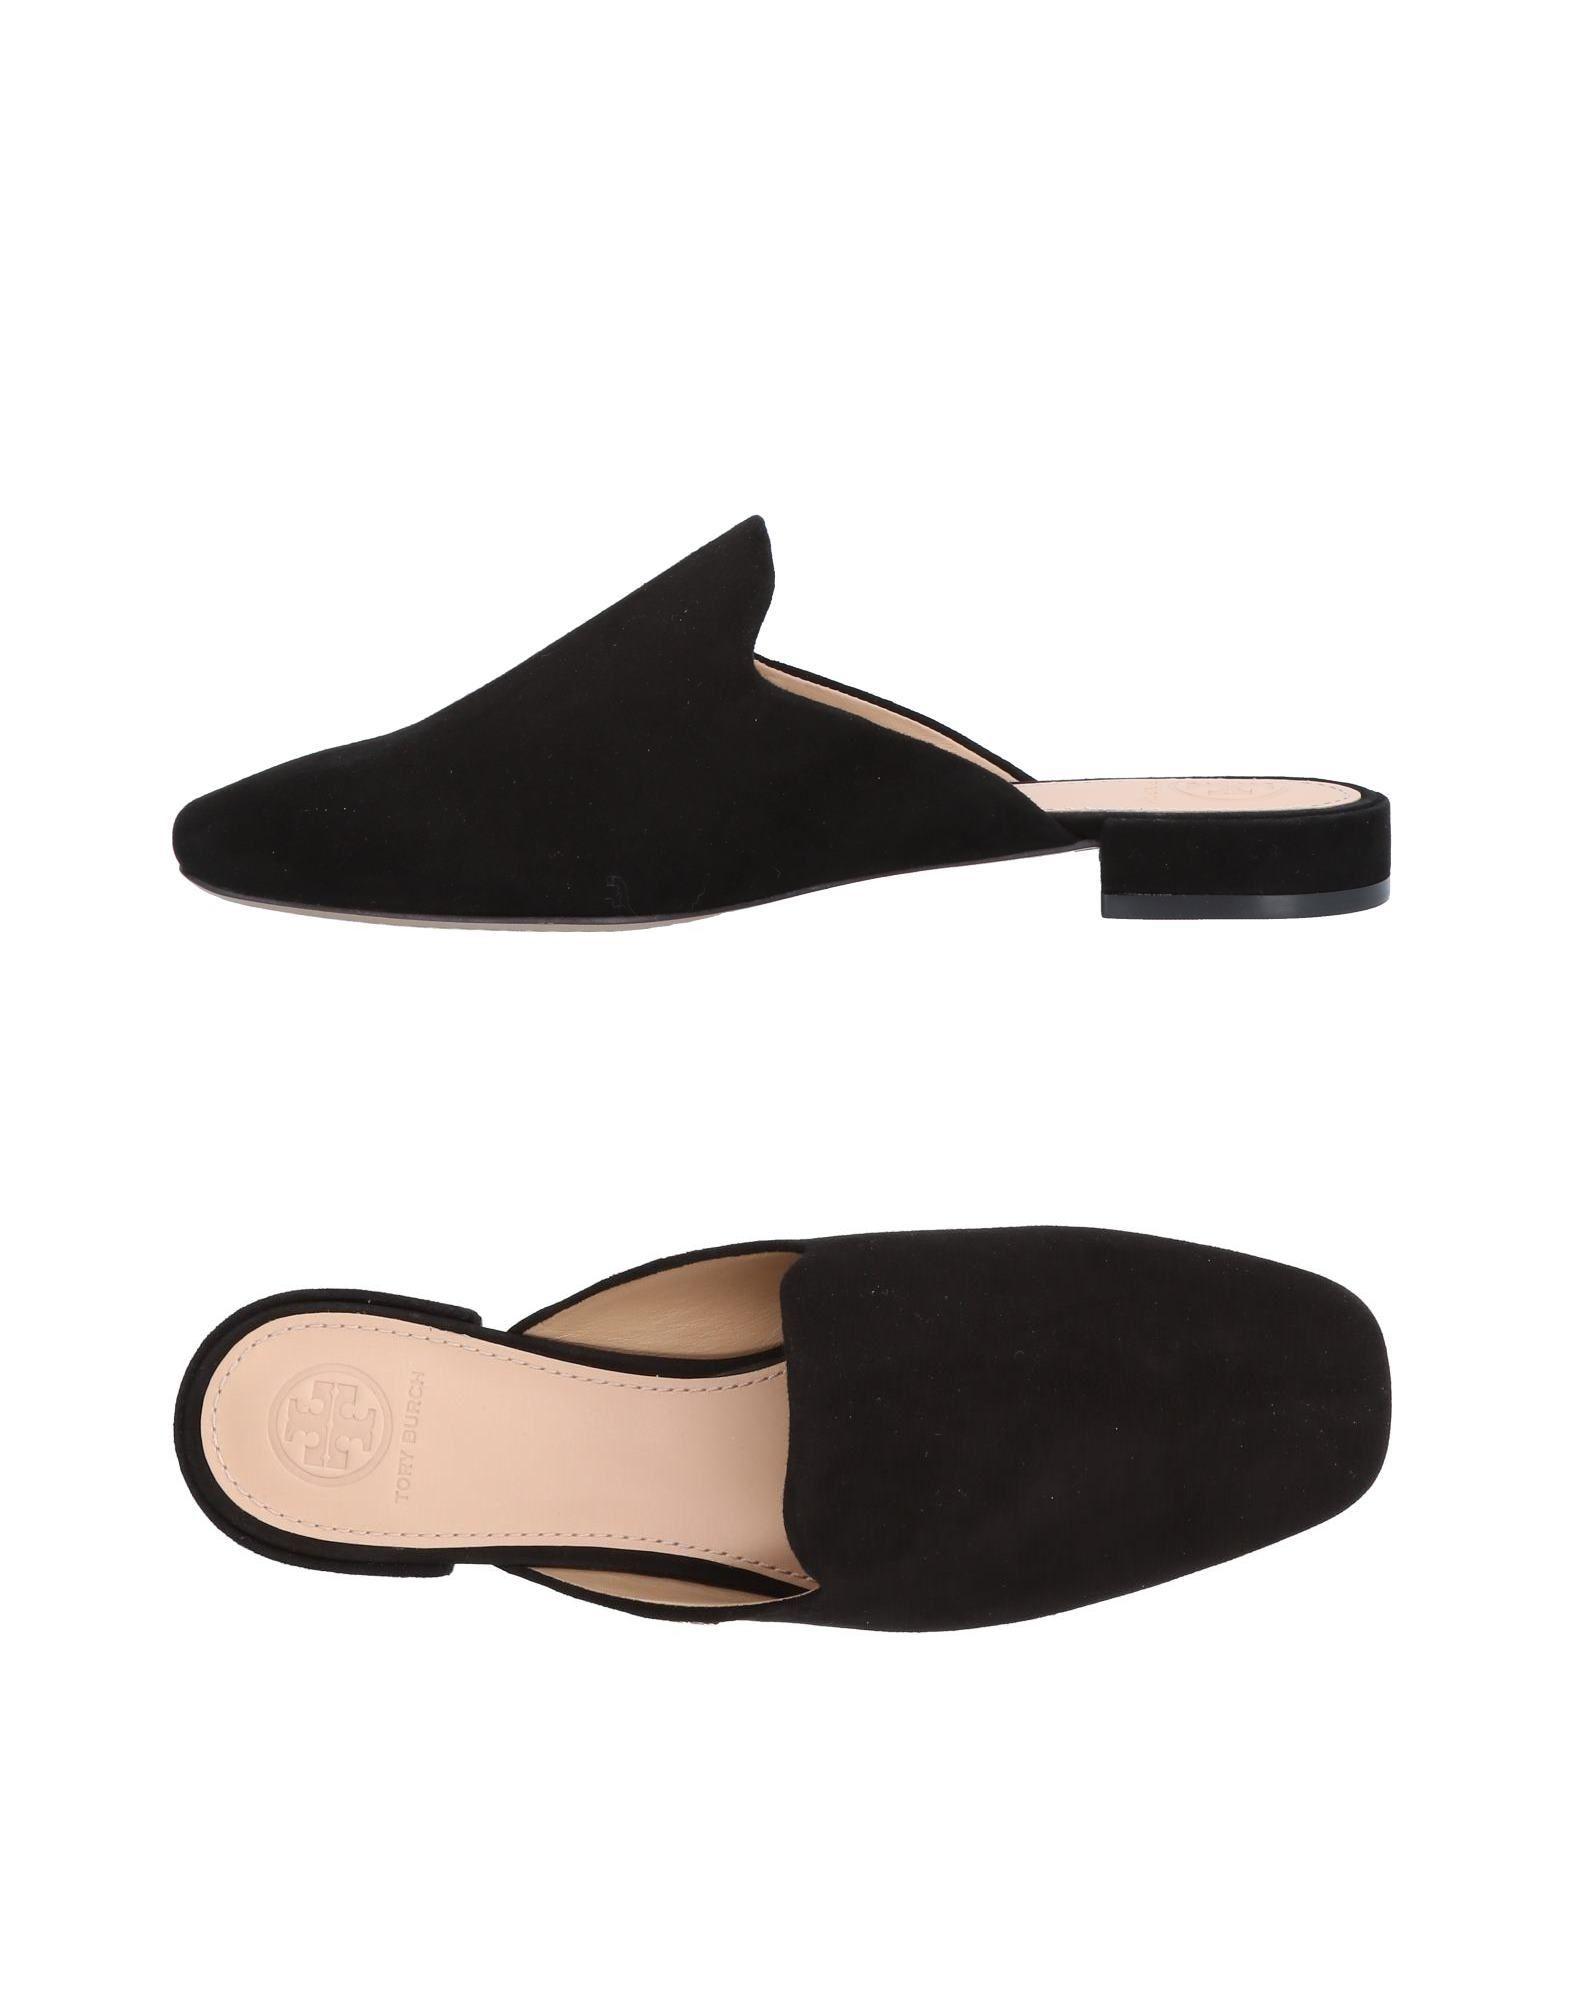 Tory Burch Pantoletten Damen  11487933RXGut aussehende strapazierfähige Schuhe